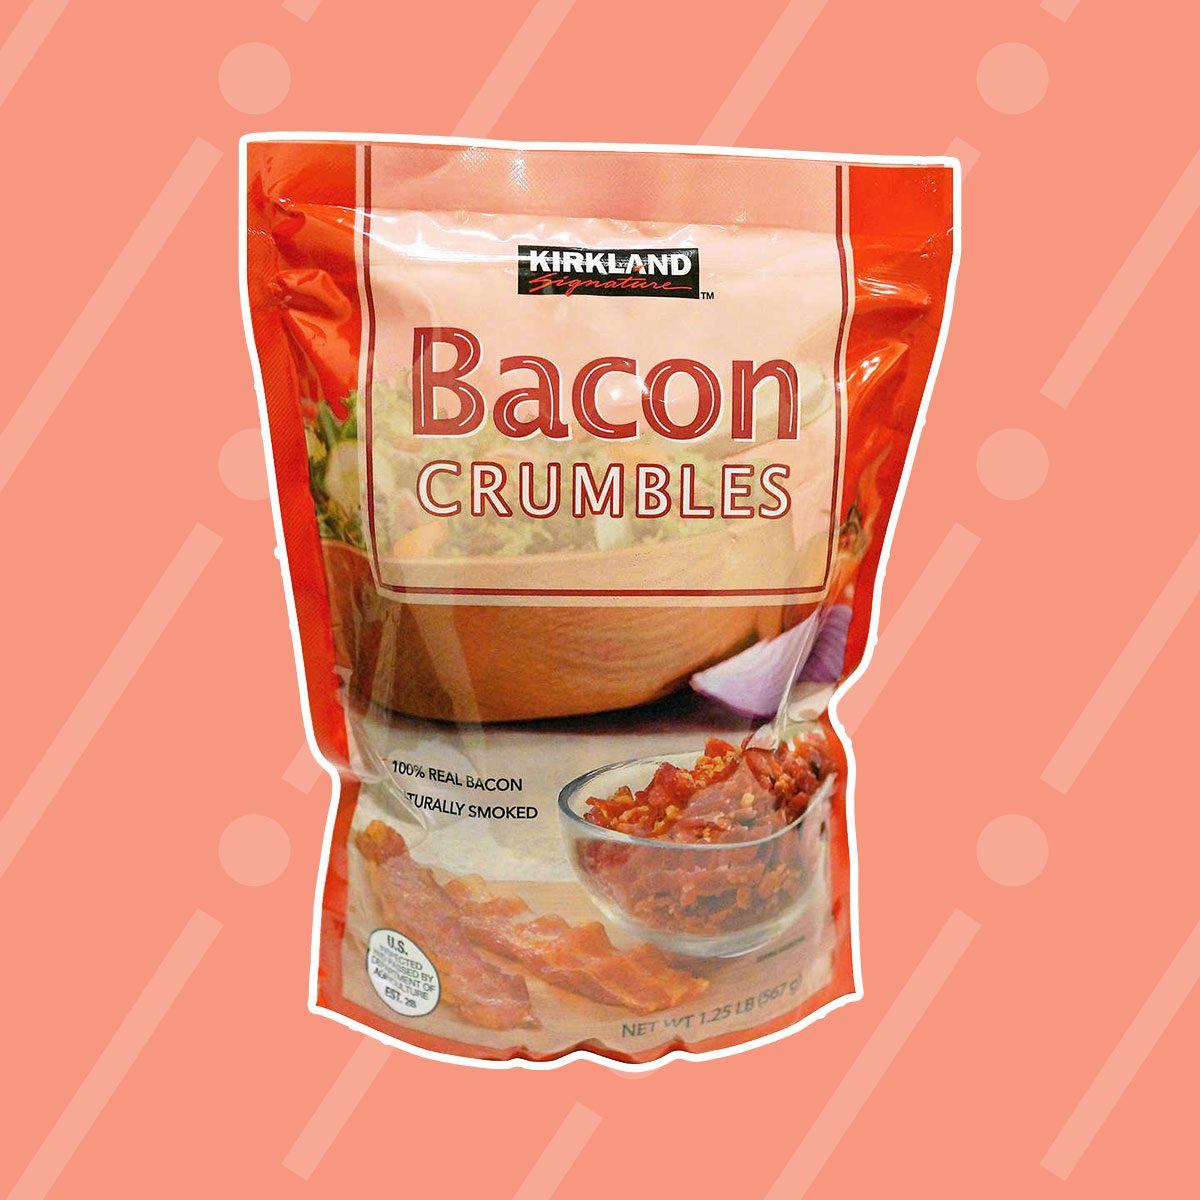 Kirkland Crumbled Bacon